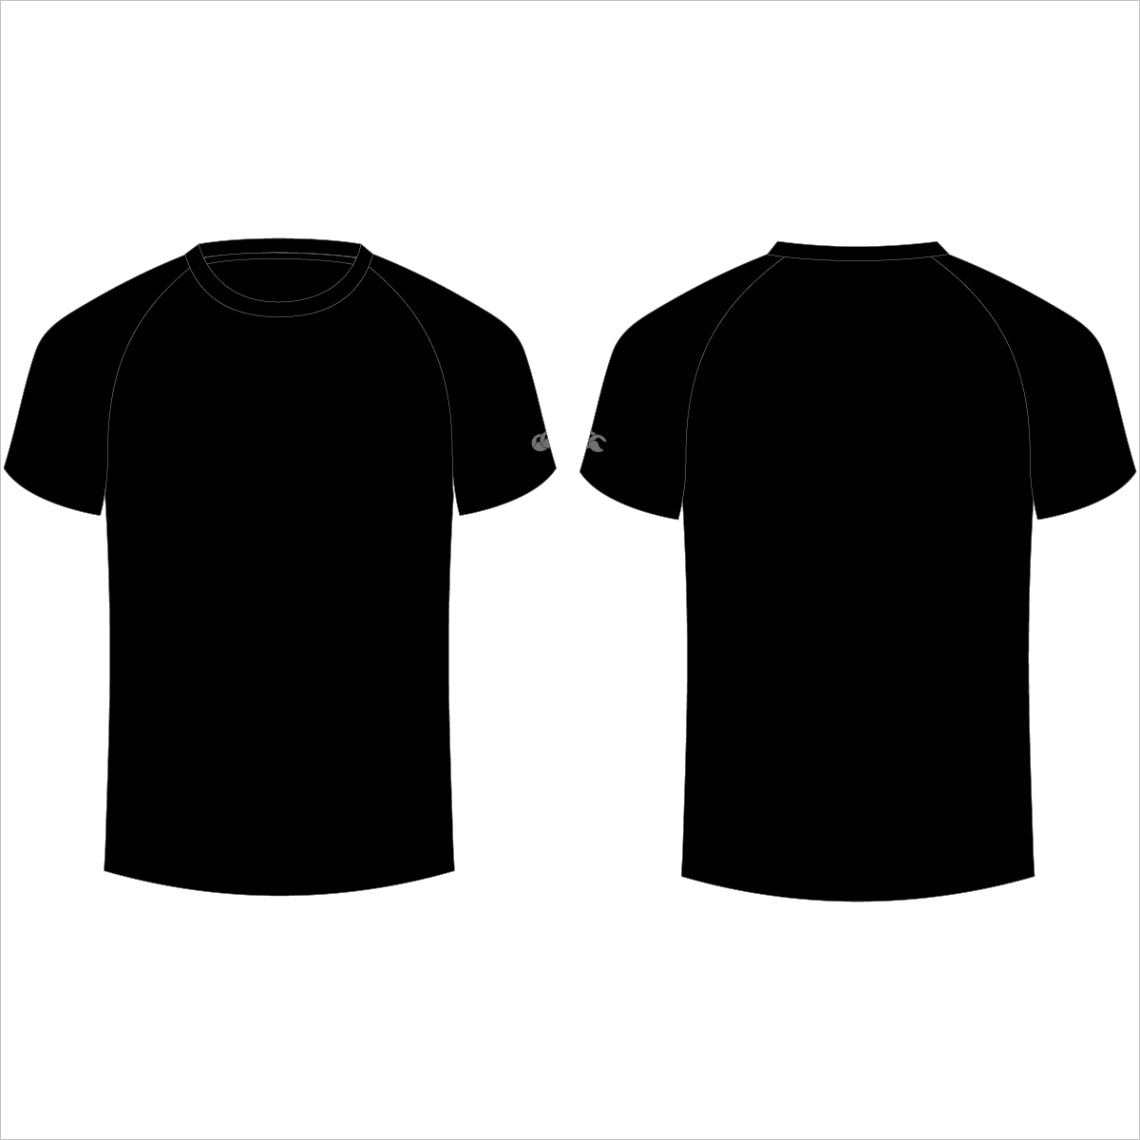 a blank black t shirt design